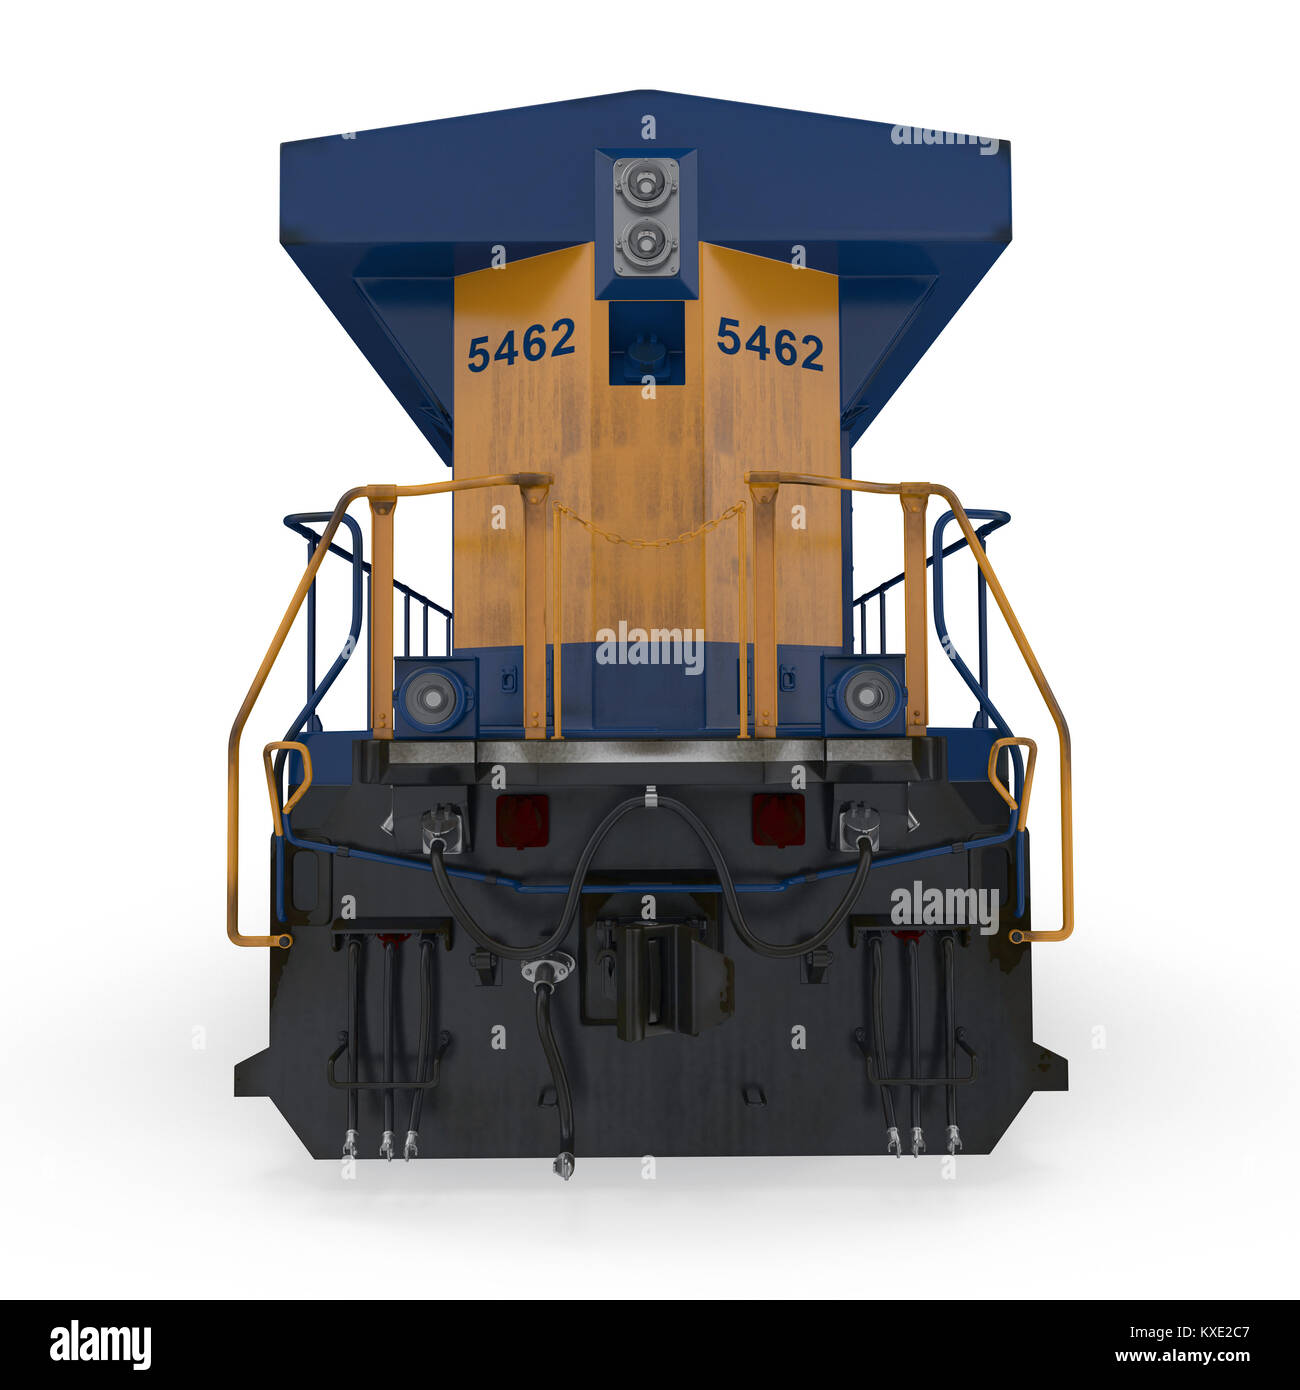 Diesel Locomotive on white. Rear view. 3D illustration - Stock Image